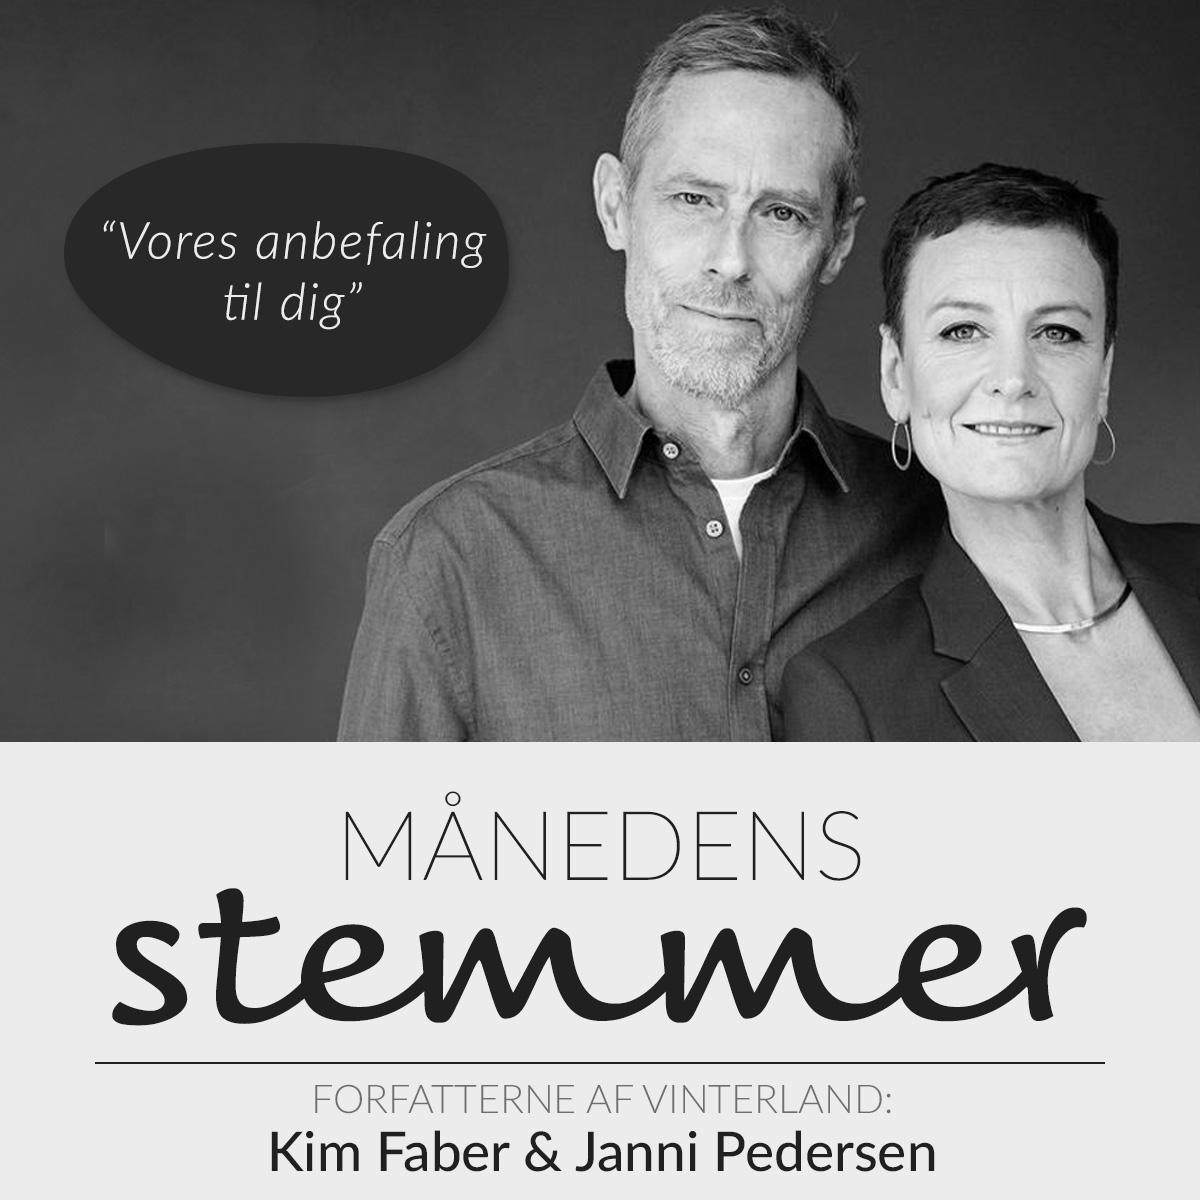 Kim Faber & Janni Pedersen anbefaler